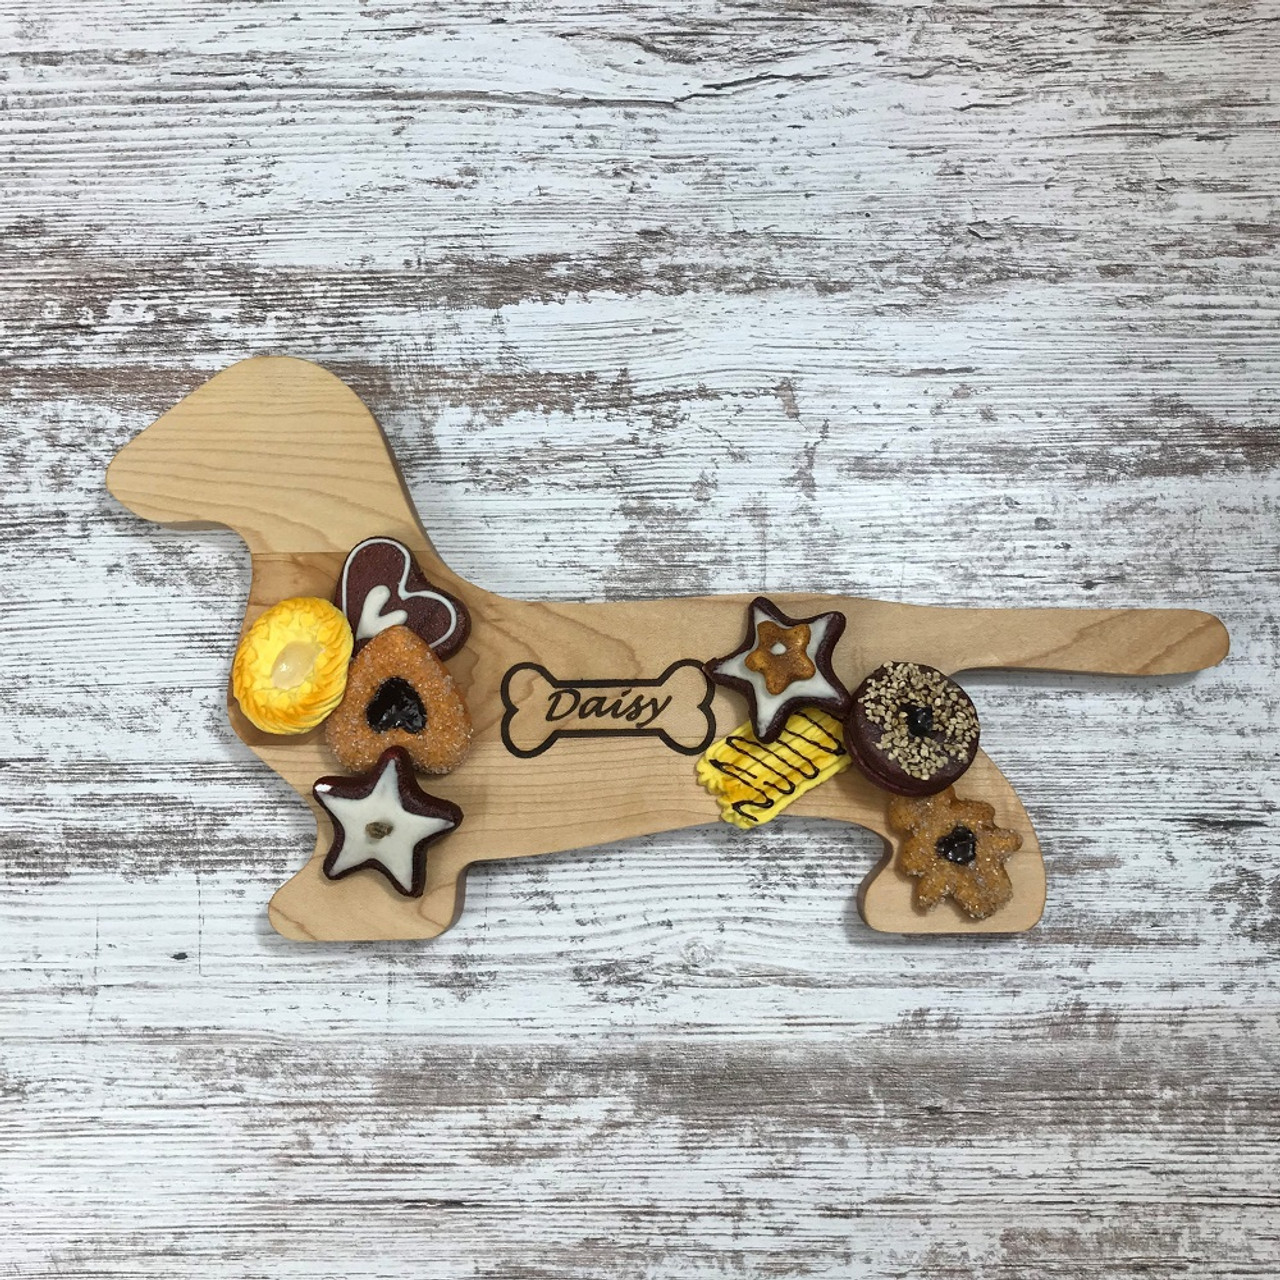 Personalized Maple Wood Dachshund Cutting Board